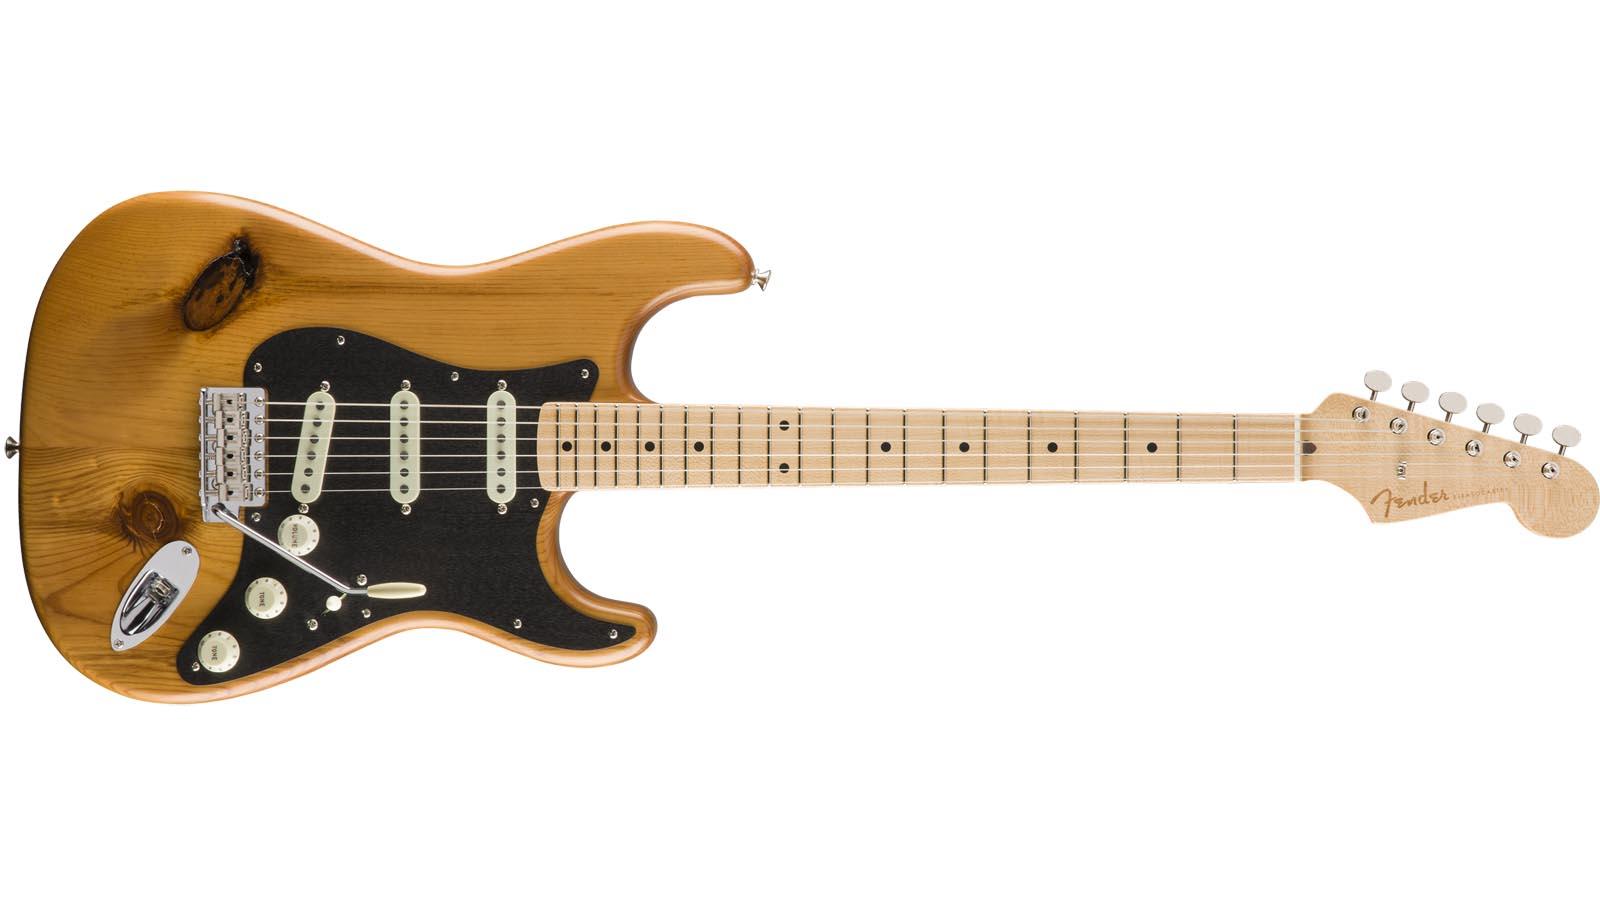 Fender 2017 Limited Edition American Vintage '59 Pine Stratocaster